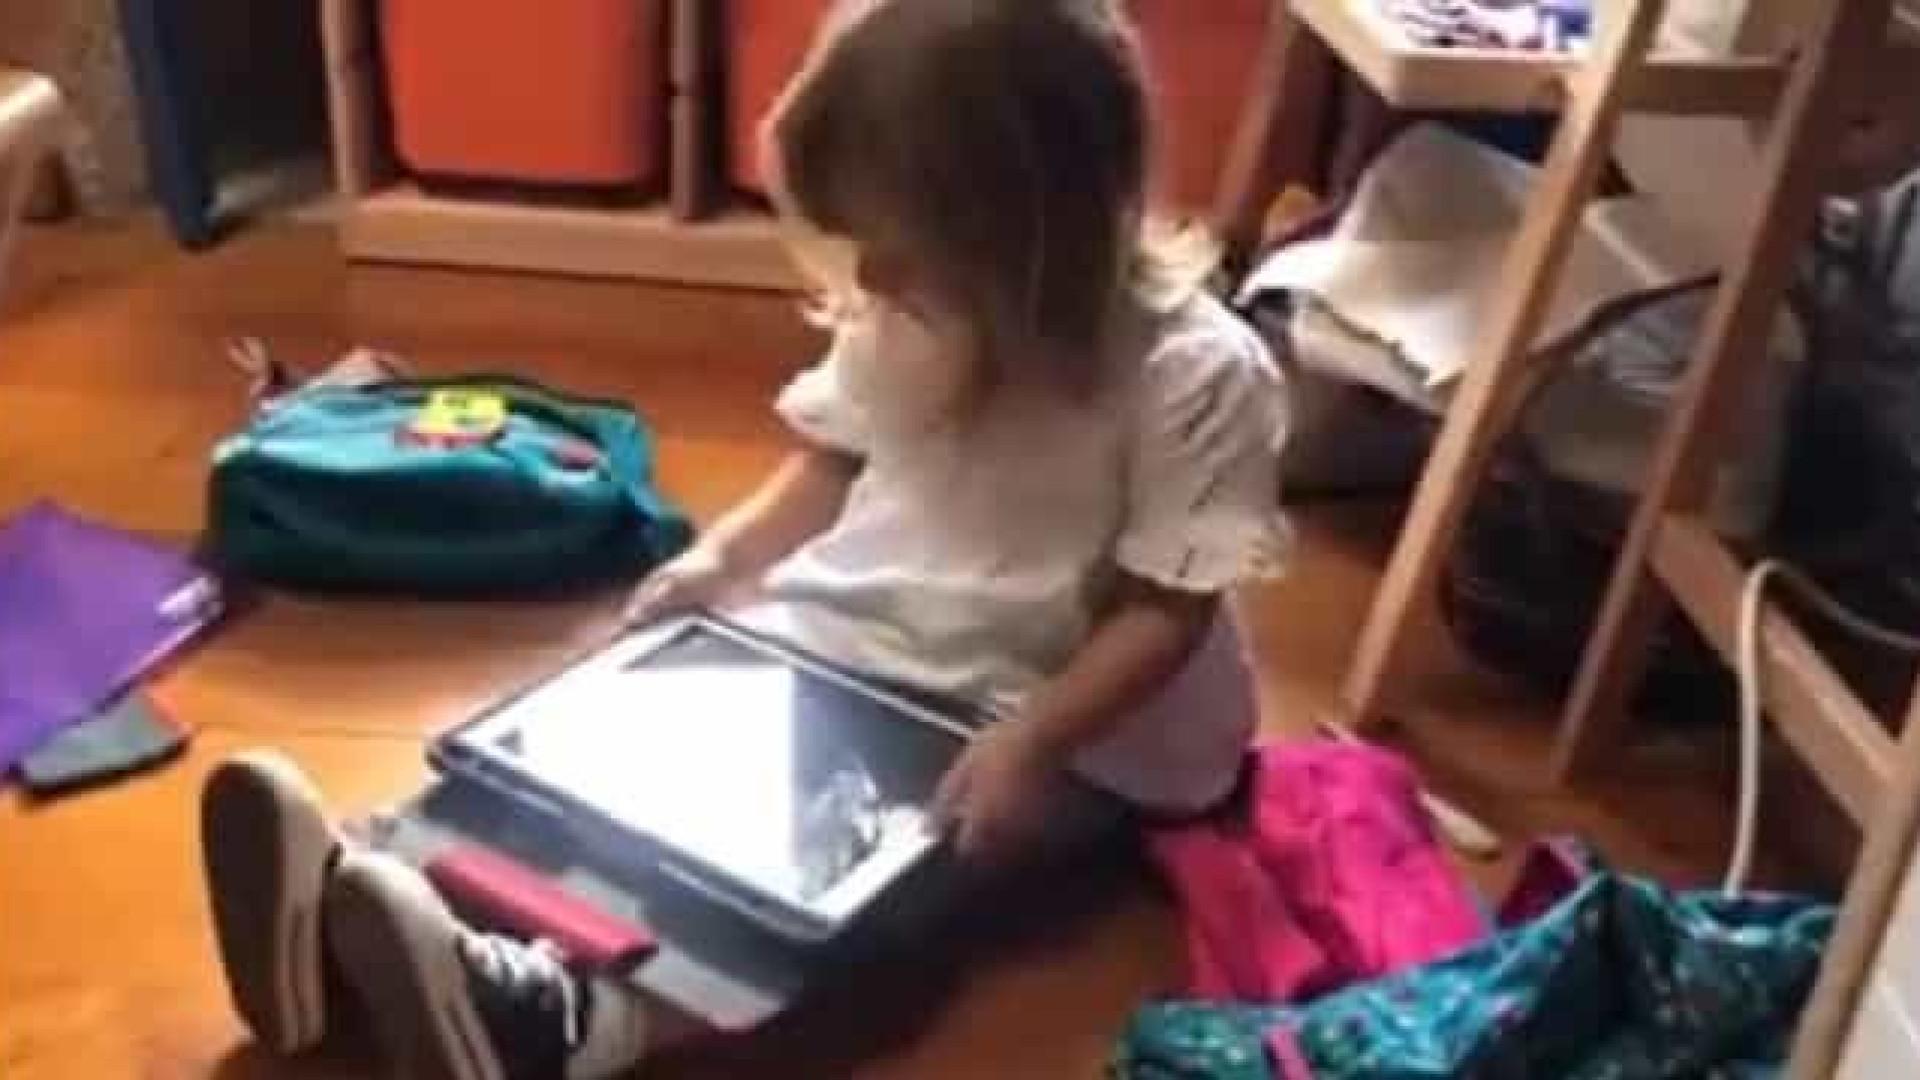 Vídeo de criança tentando ensinar a Siri a falar galego viraliza na web